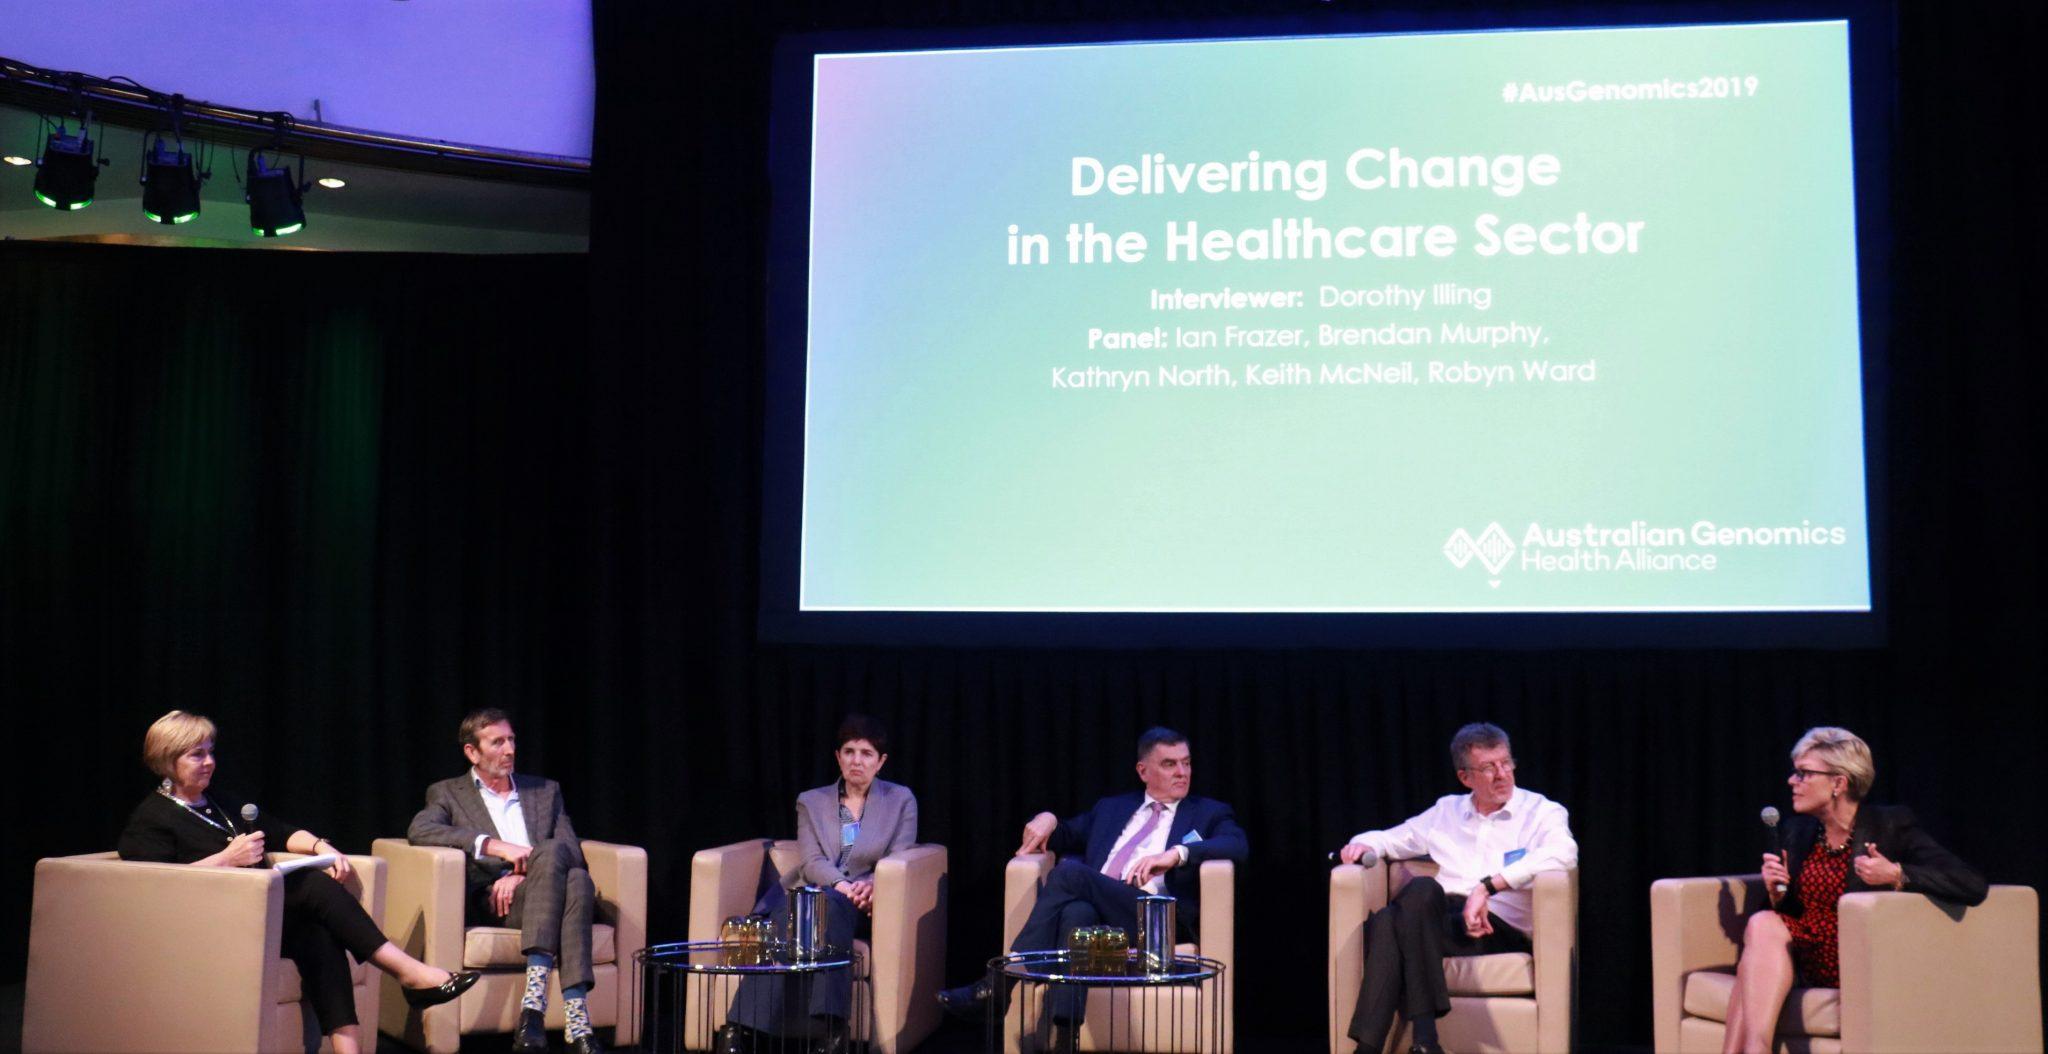 Panel Discussion L-R: Dorothy Illing, Keith McNeil, Robyn Ward, Brendan Murphy, Ian Frazer and Kathryn North